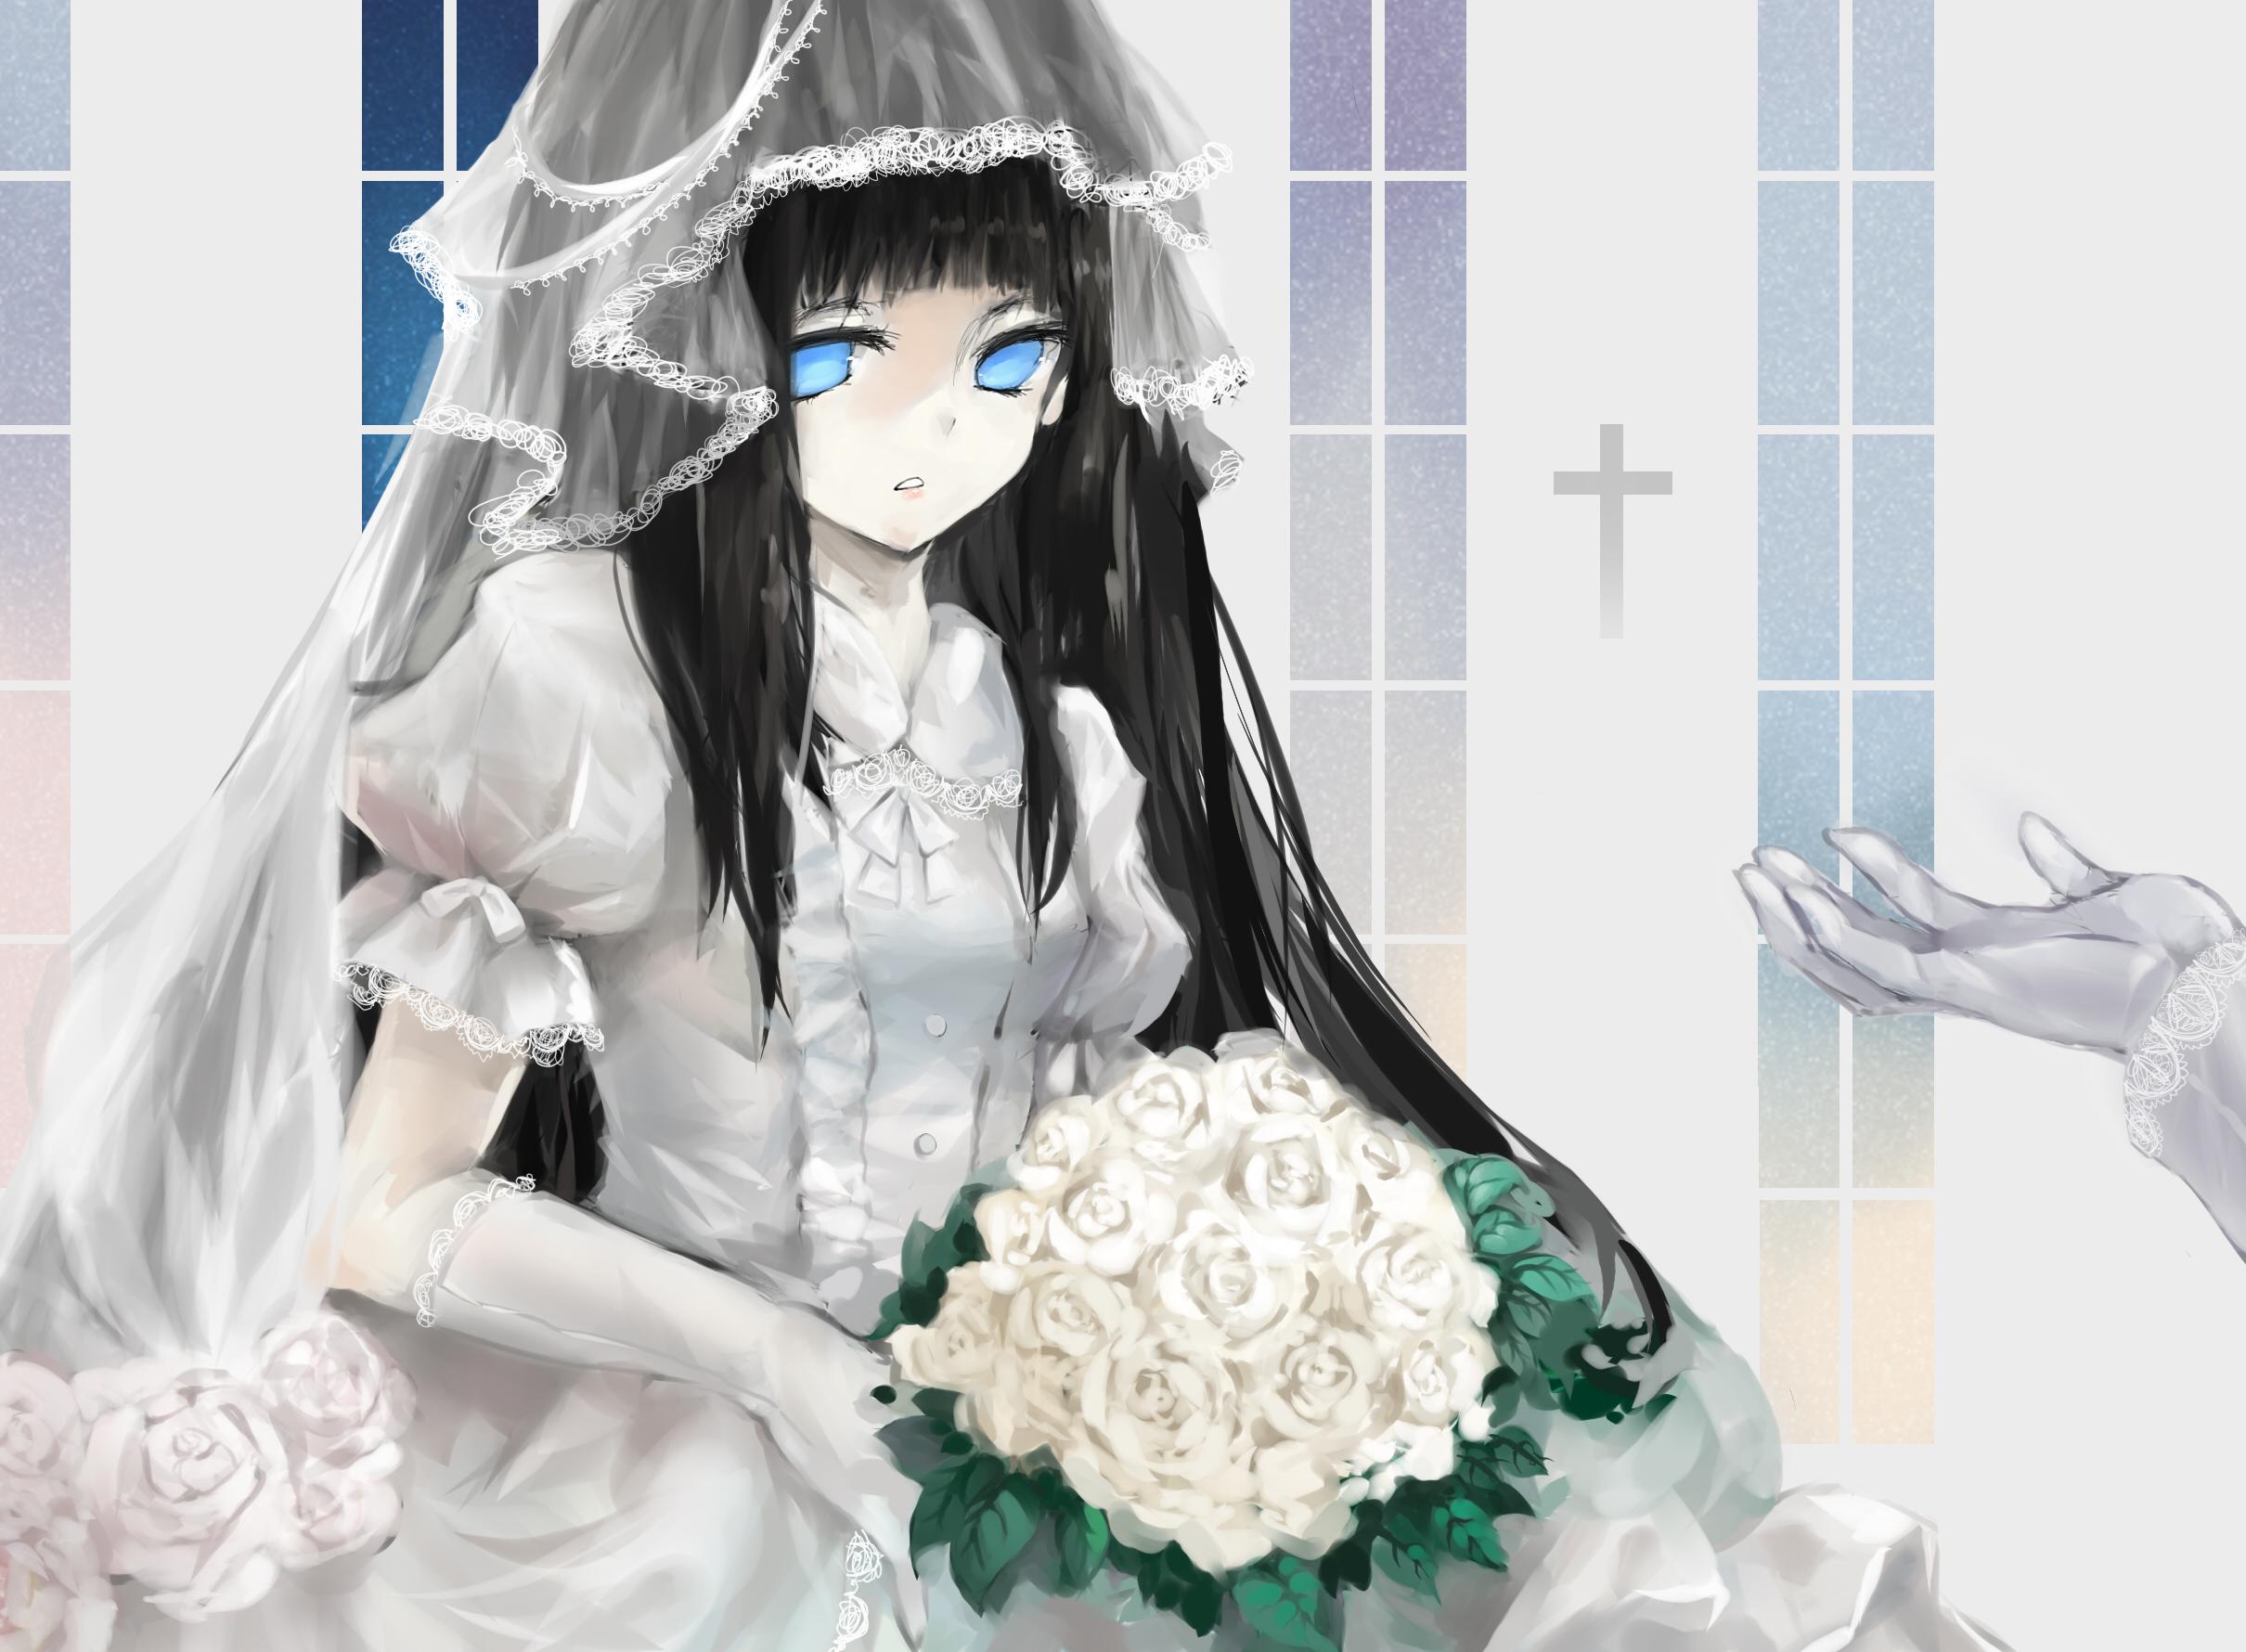 wedding dress, long hair | page 9 - zerochan anime image board